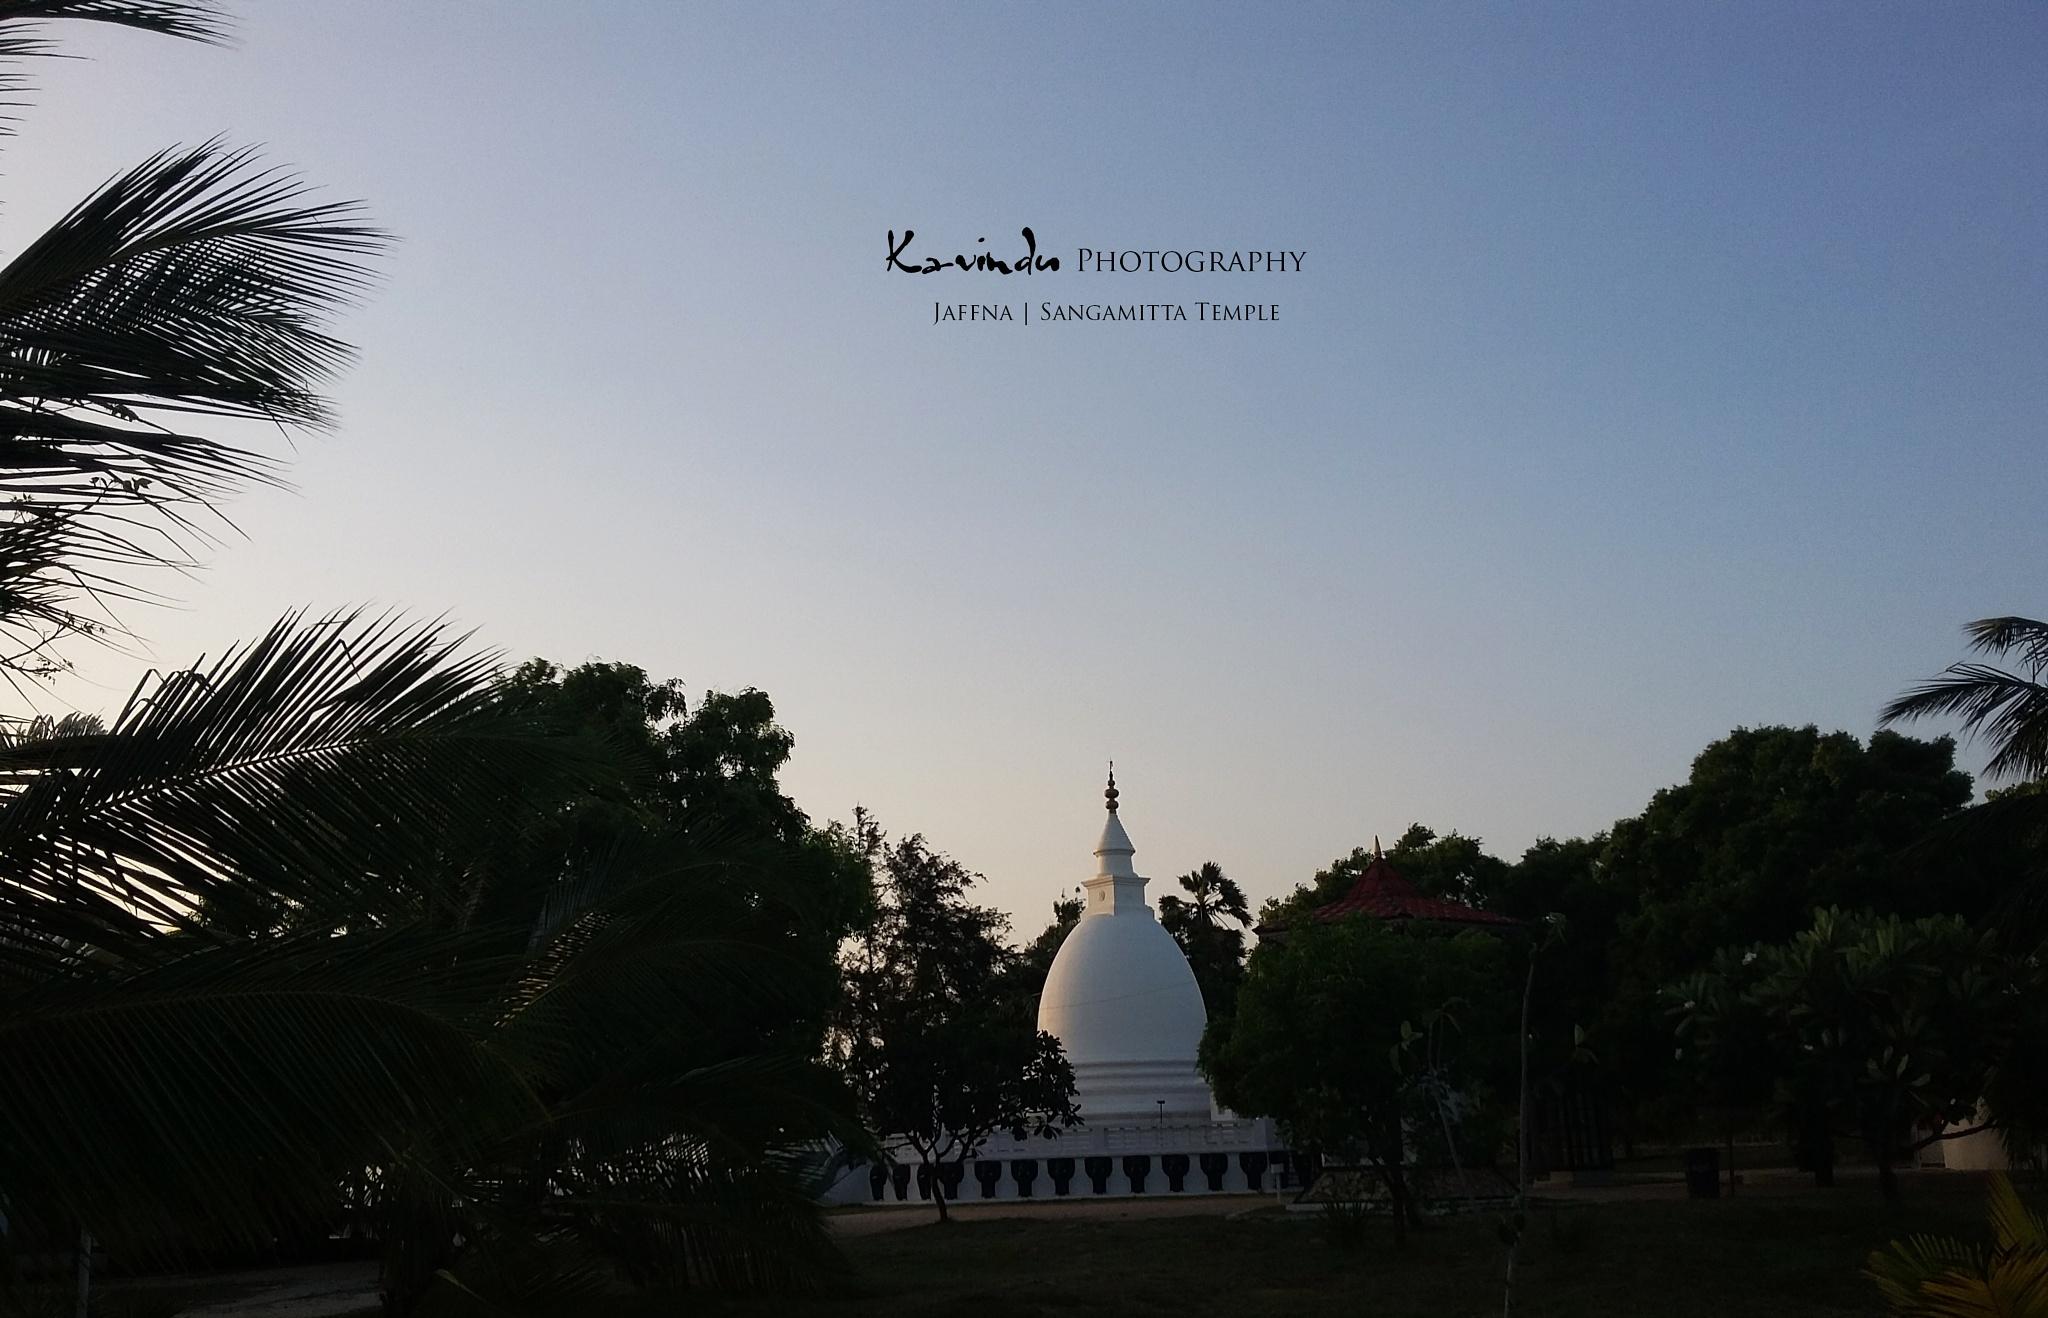 Untitled by Kavindu Shrimal Karunarathna